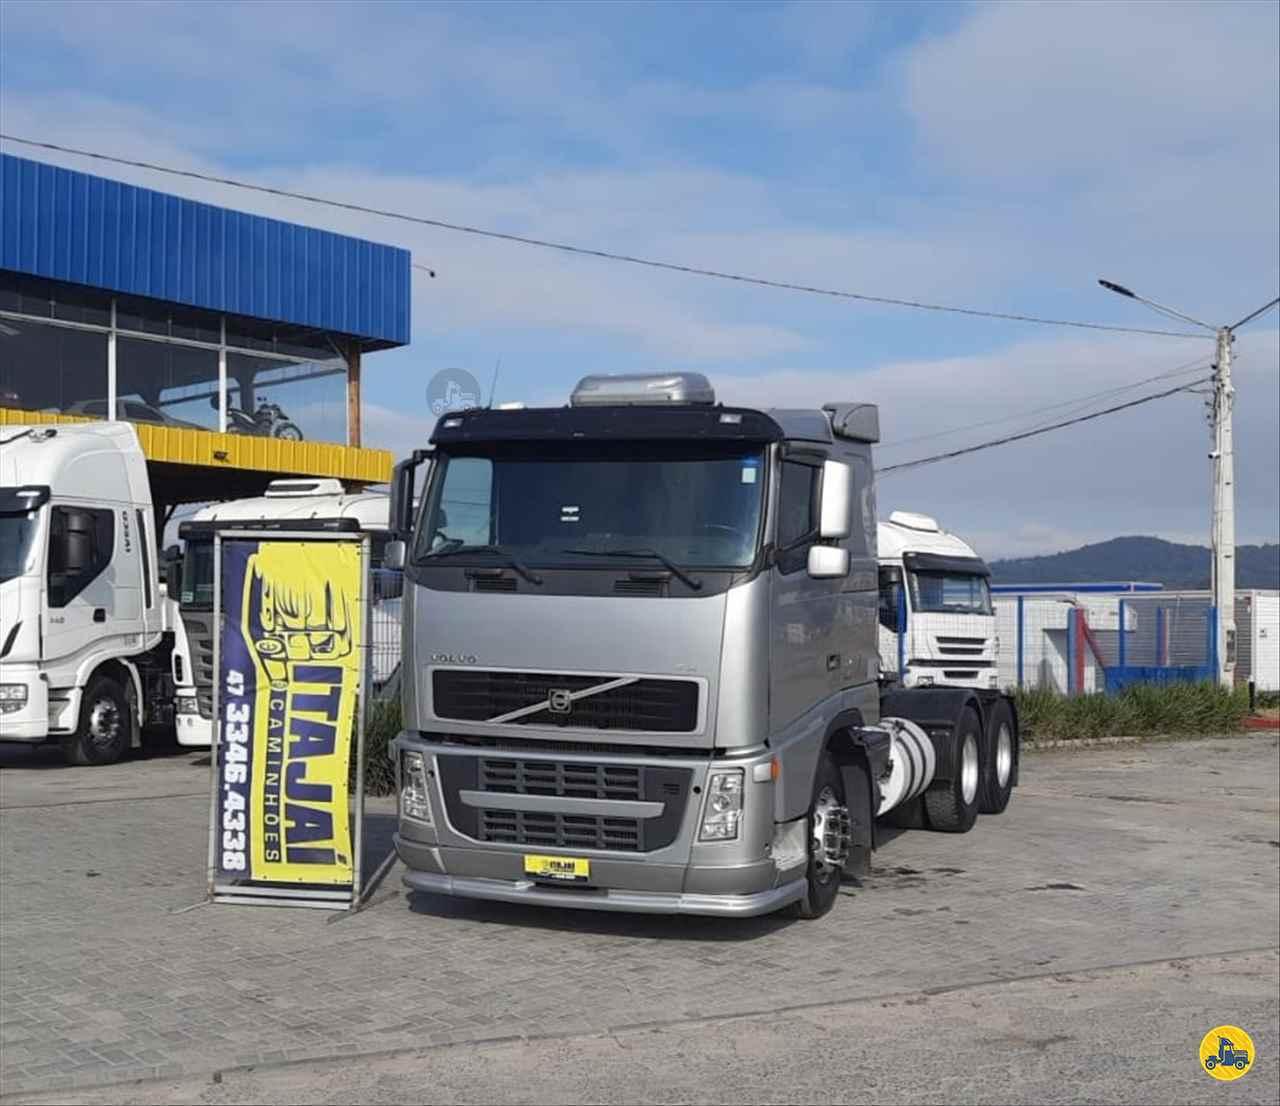 CAMINHAO VOLVO VOLVO FH 440 Cavalo Mecânico Truck 6x2 Itajai Caminhões NAVEGANTES SANTA CATARINA SC